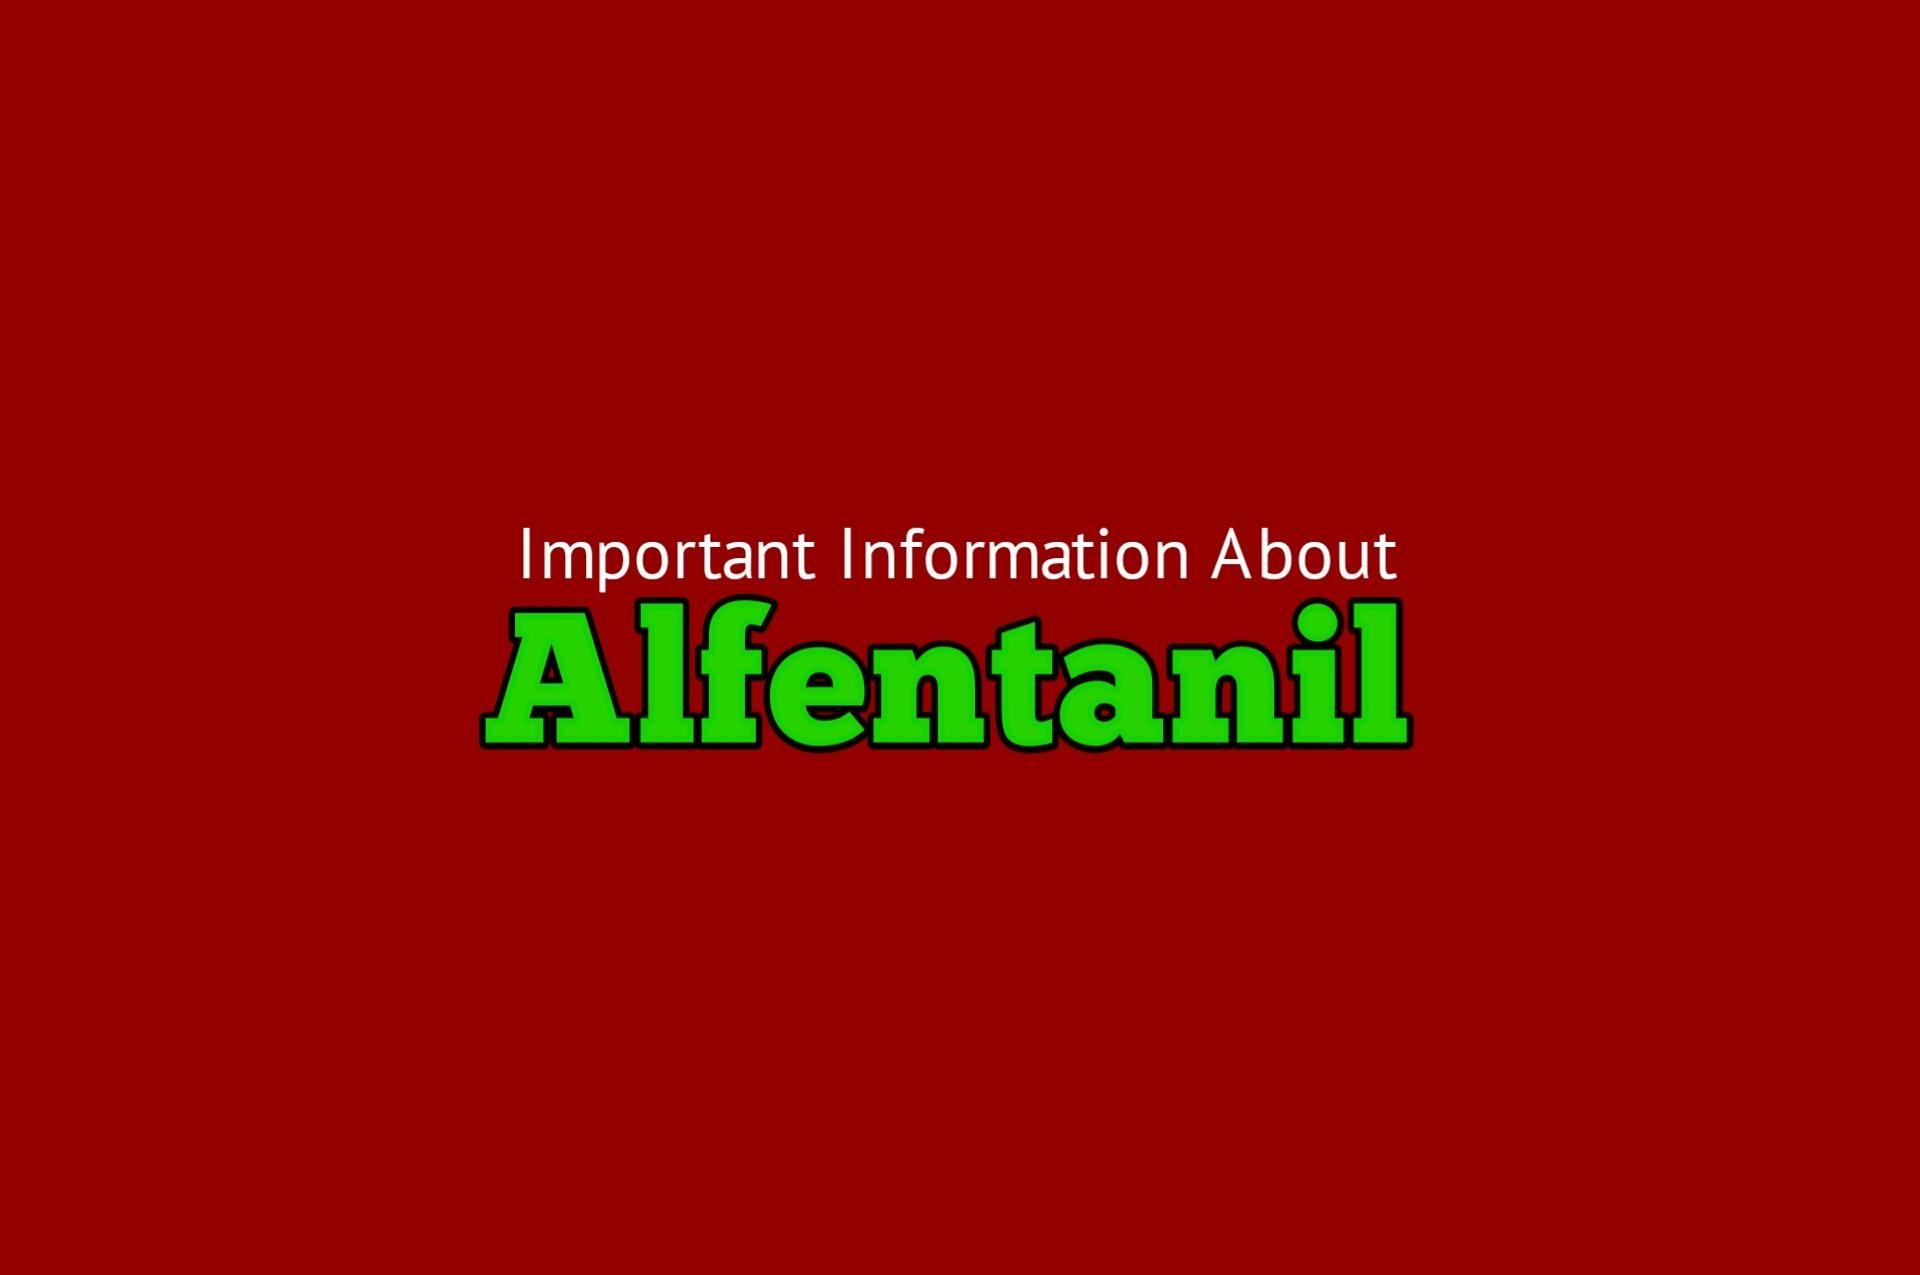 Alfentanil